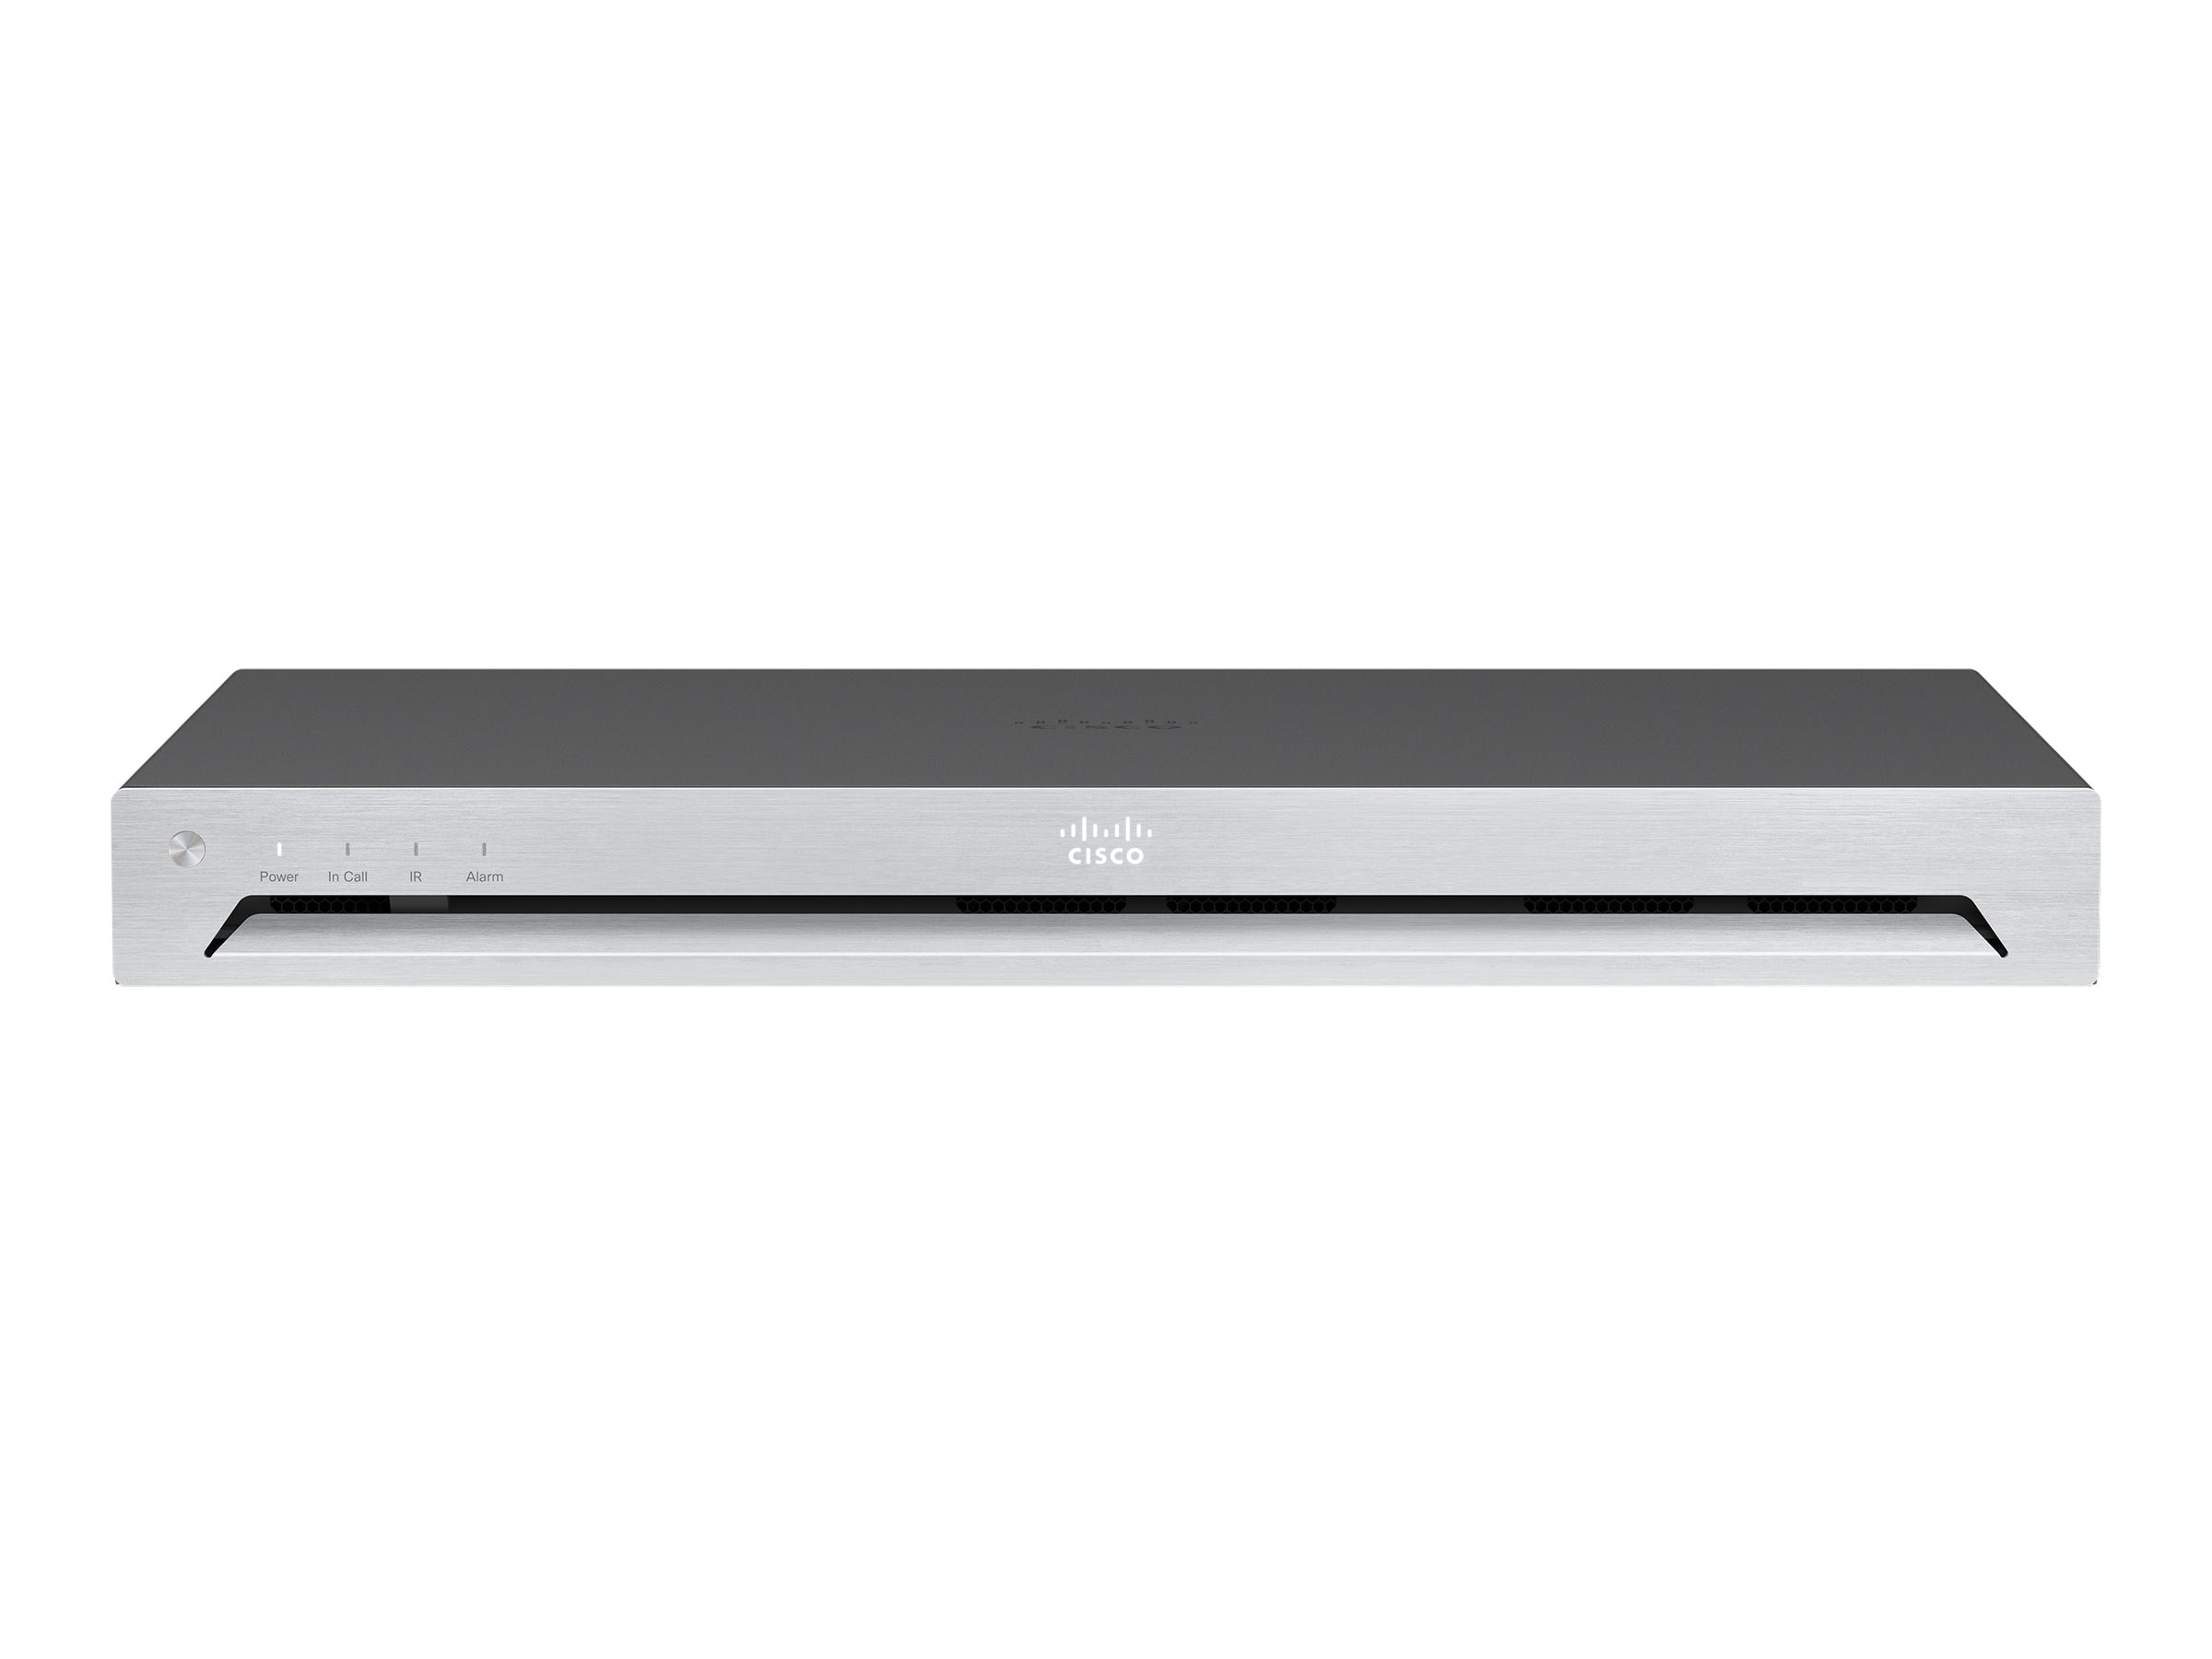 Cisco SX80 Codec, CTS-SX80-K9, 17225716, Audio/Video Conference Hardware